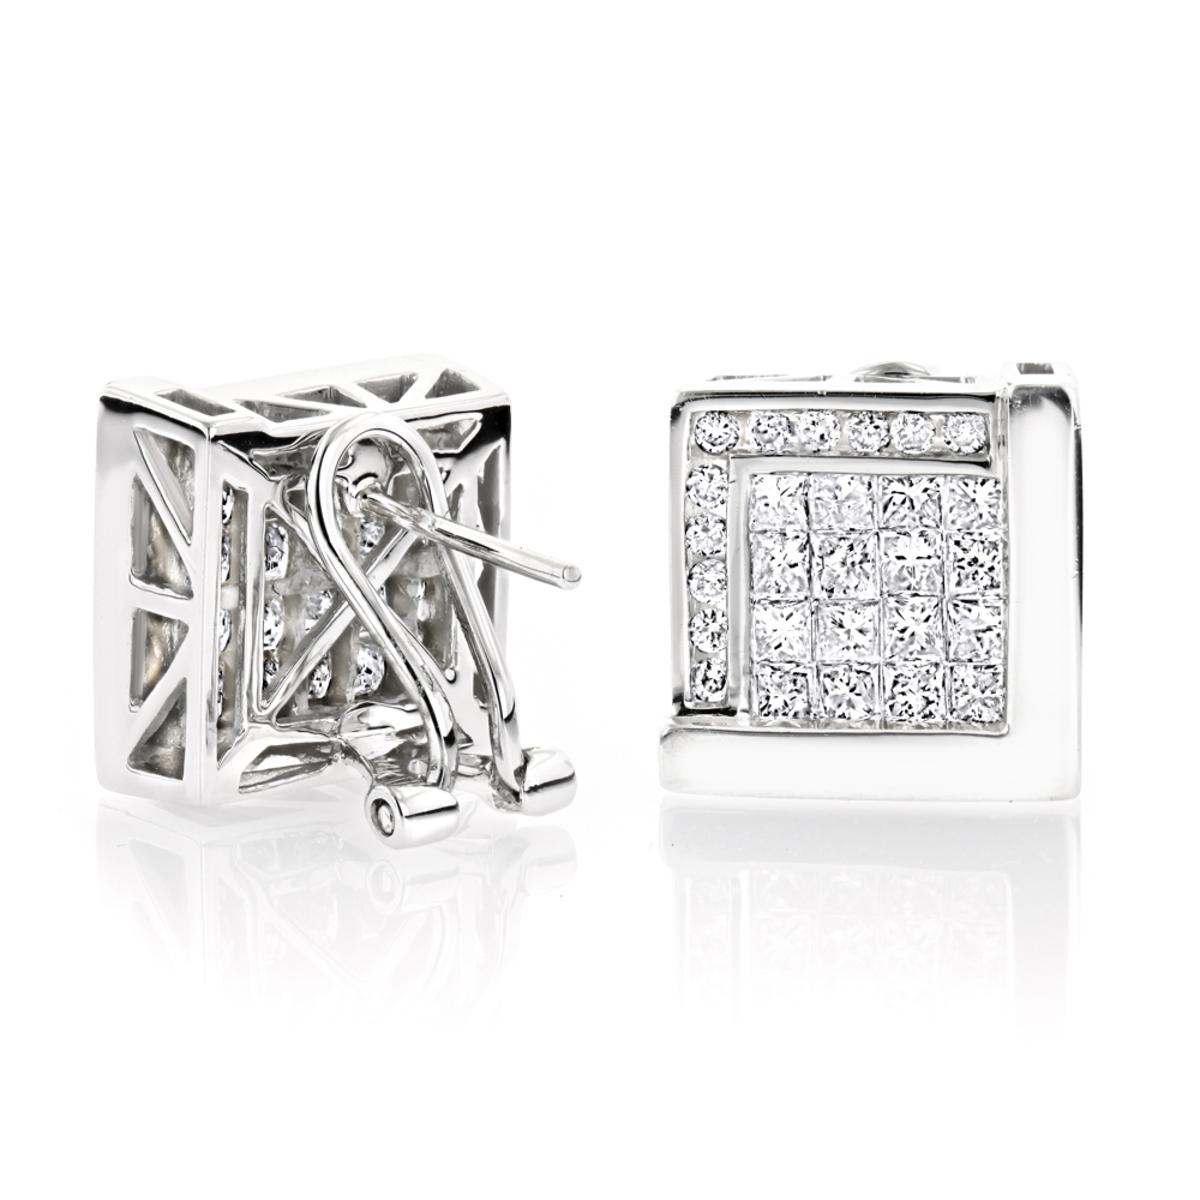 14K Gold Diamond Earrings Princess Cut & Round 2.49ct